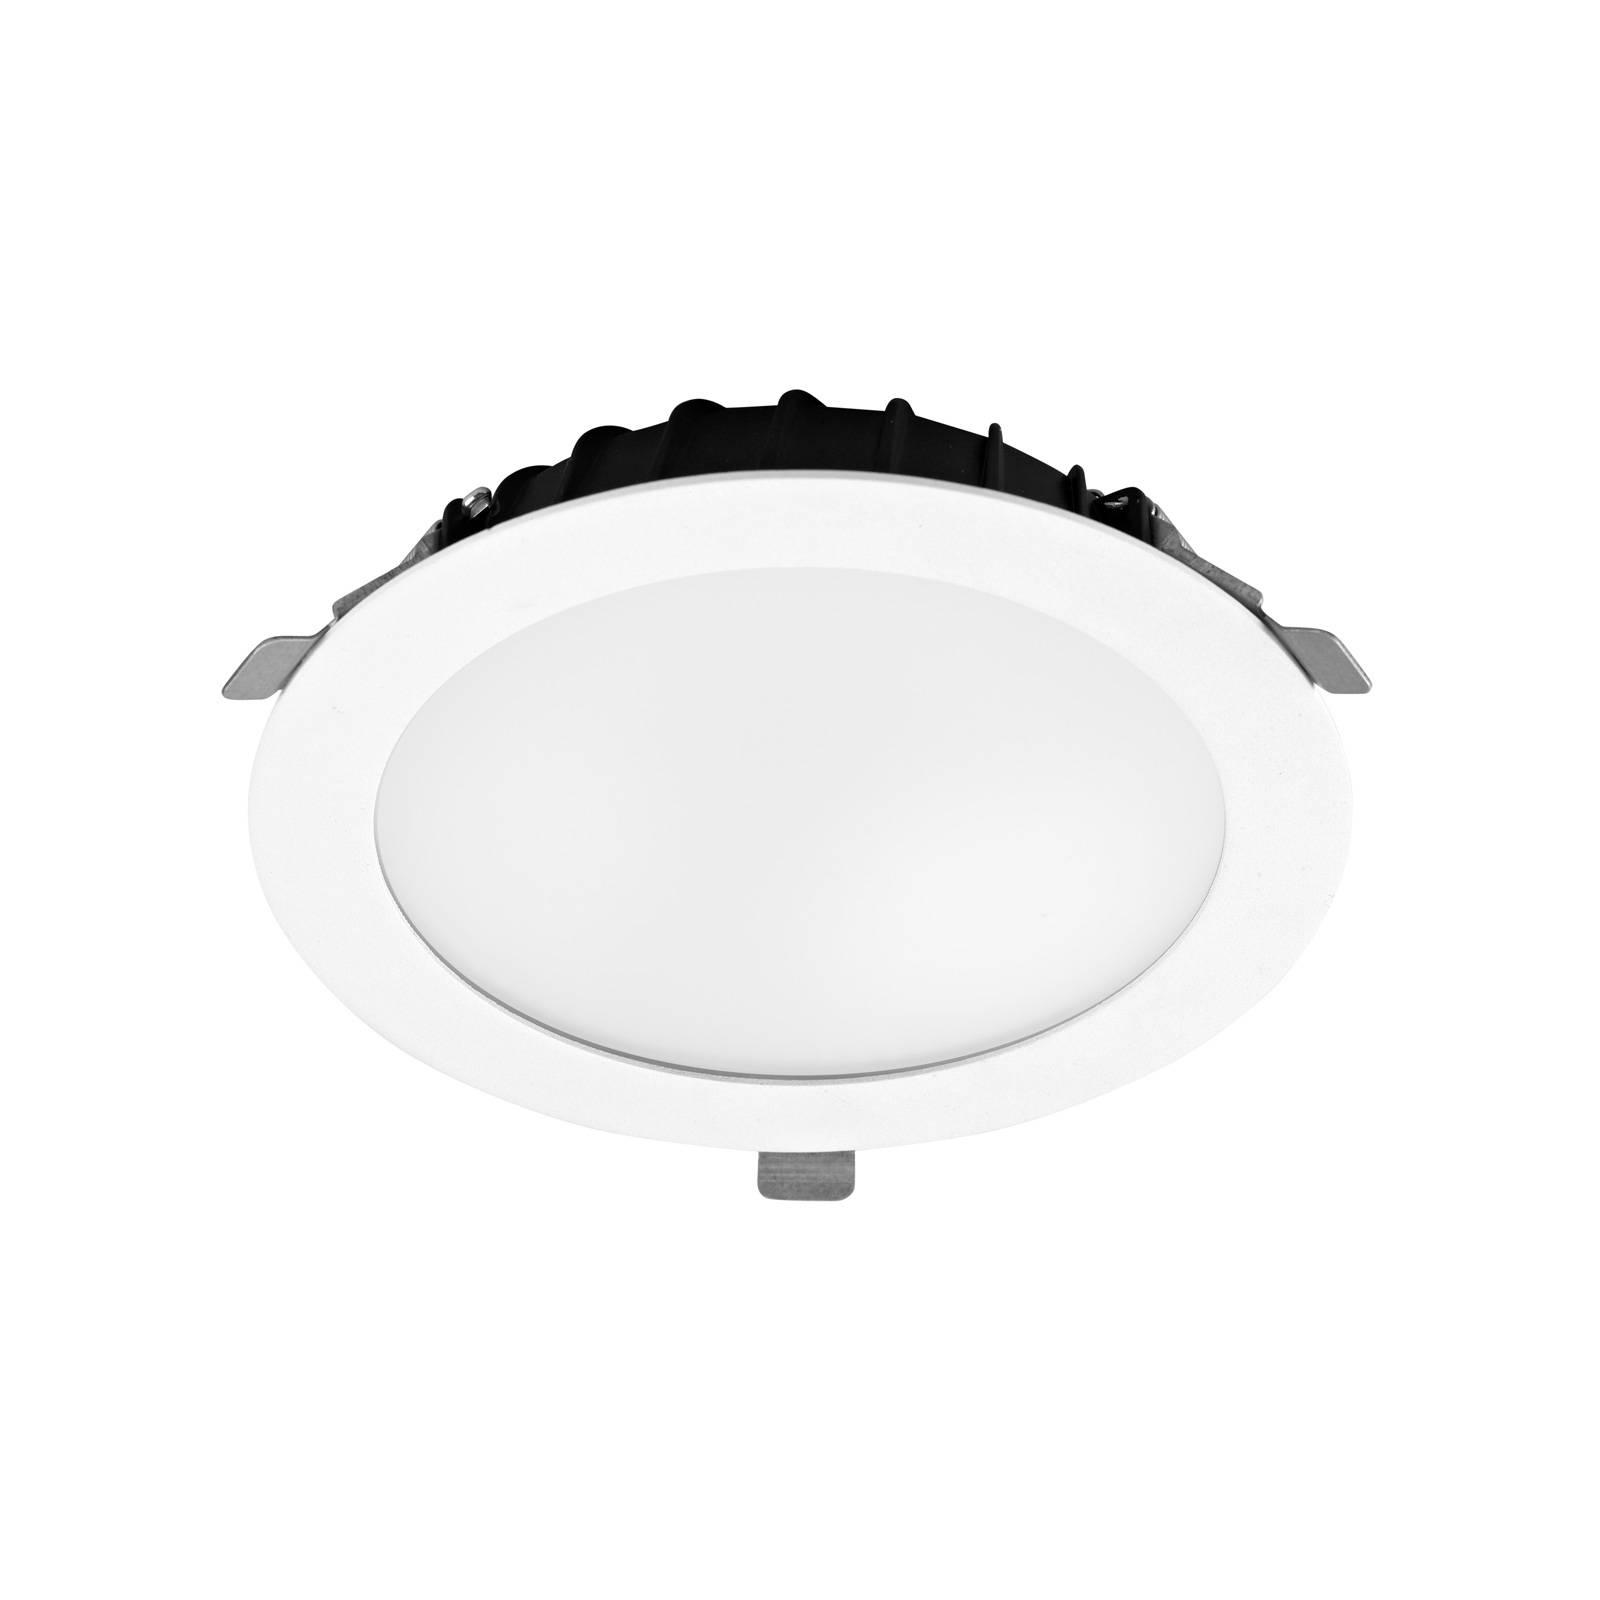 LEDS-C4 Vol -kattouppovalaisin Ø 13,4 cm 4 000 K